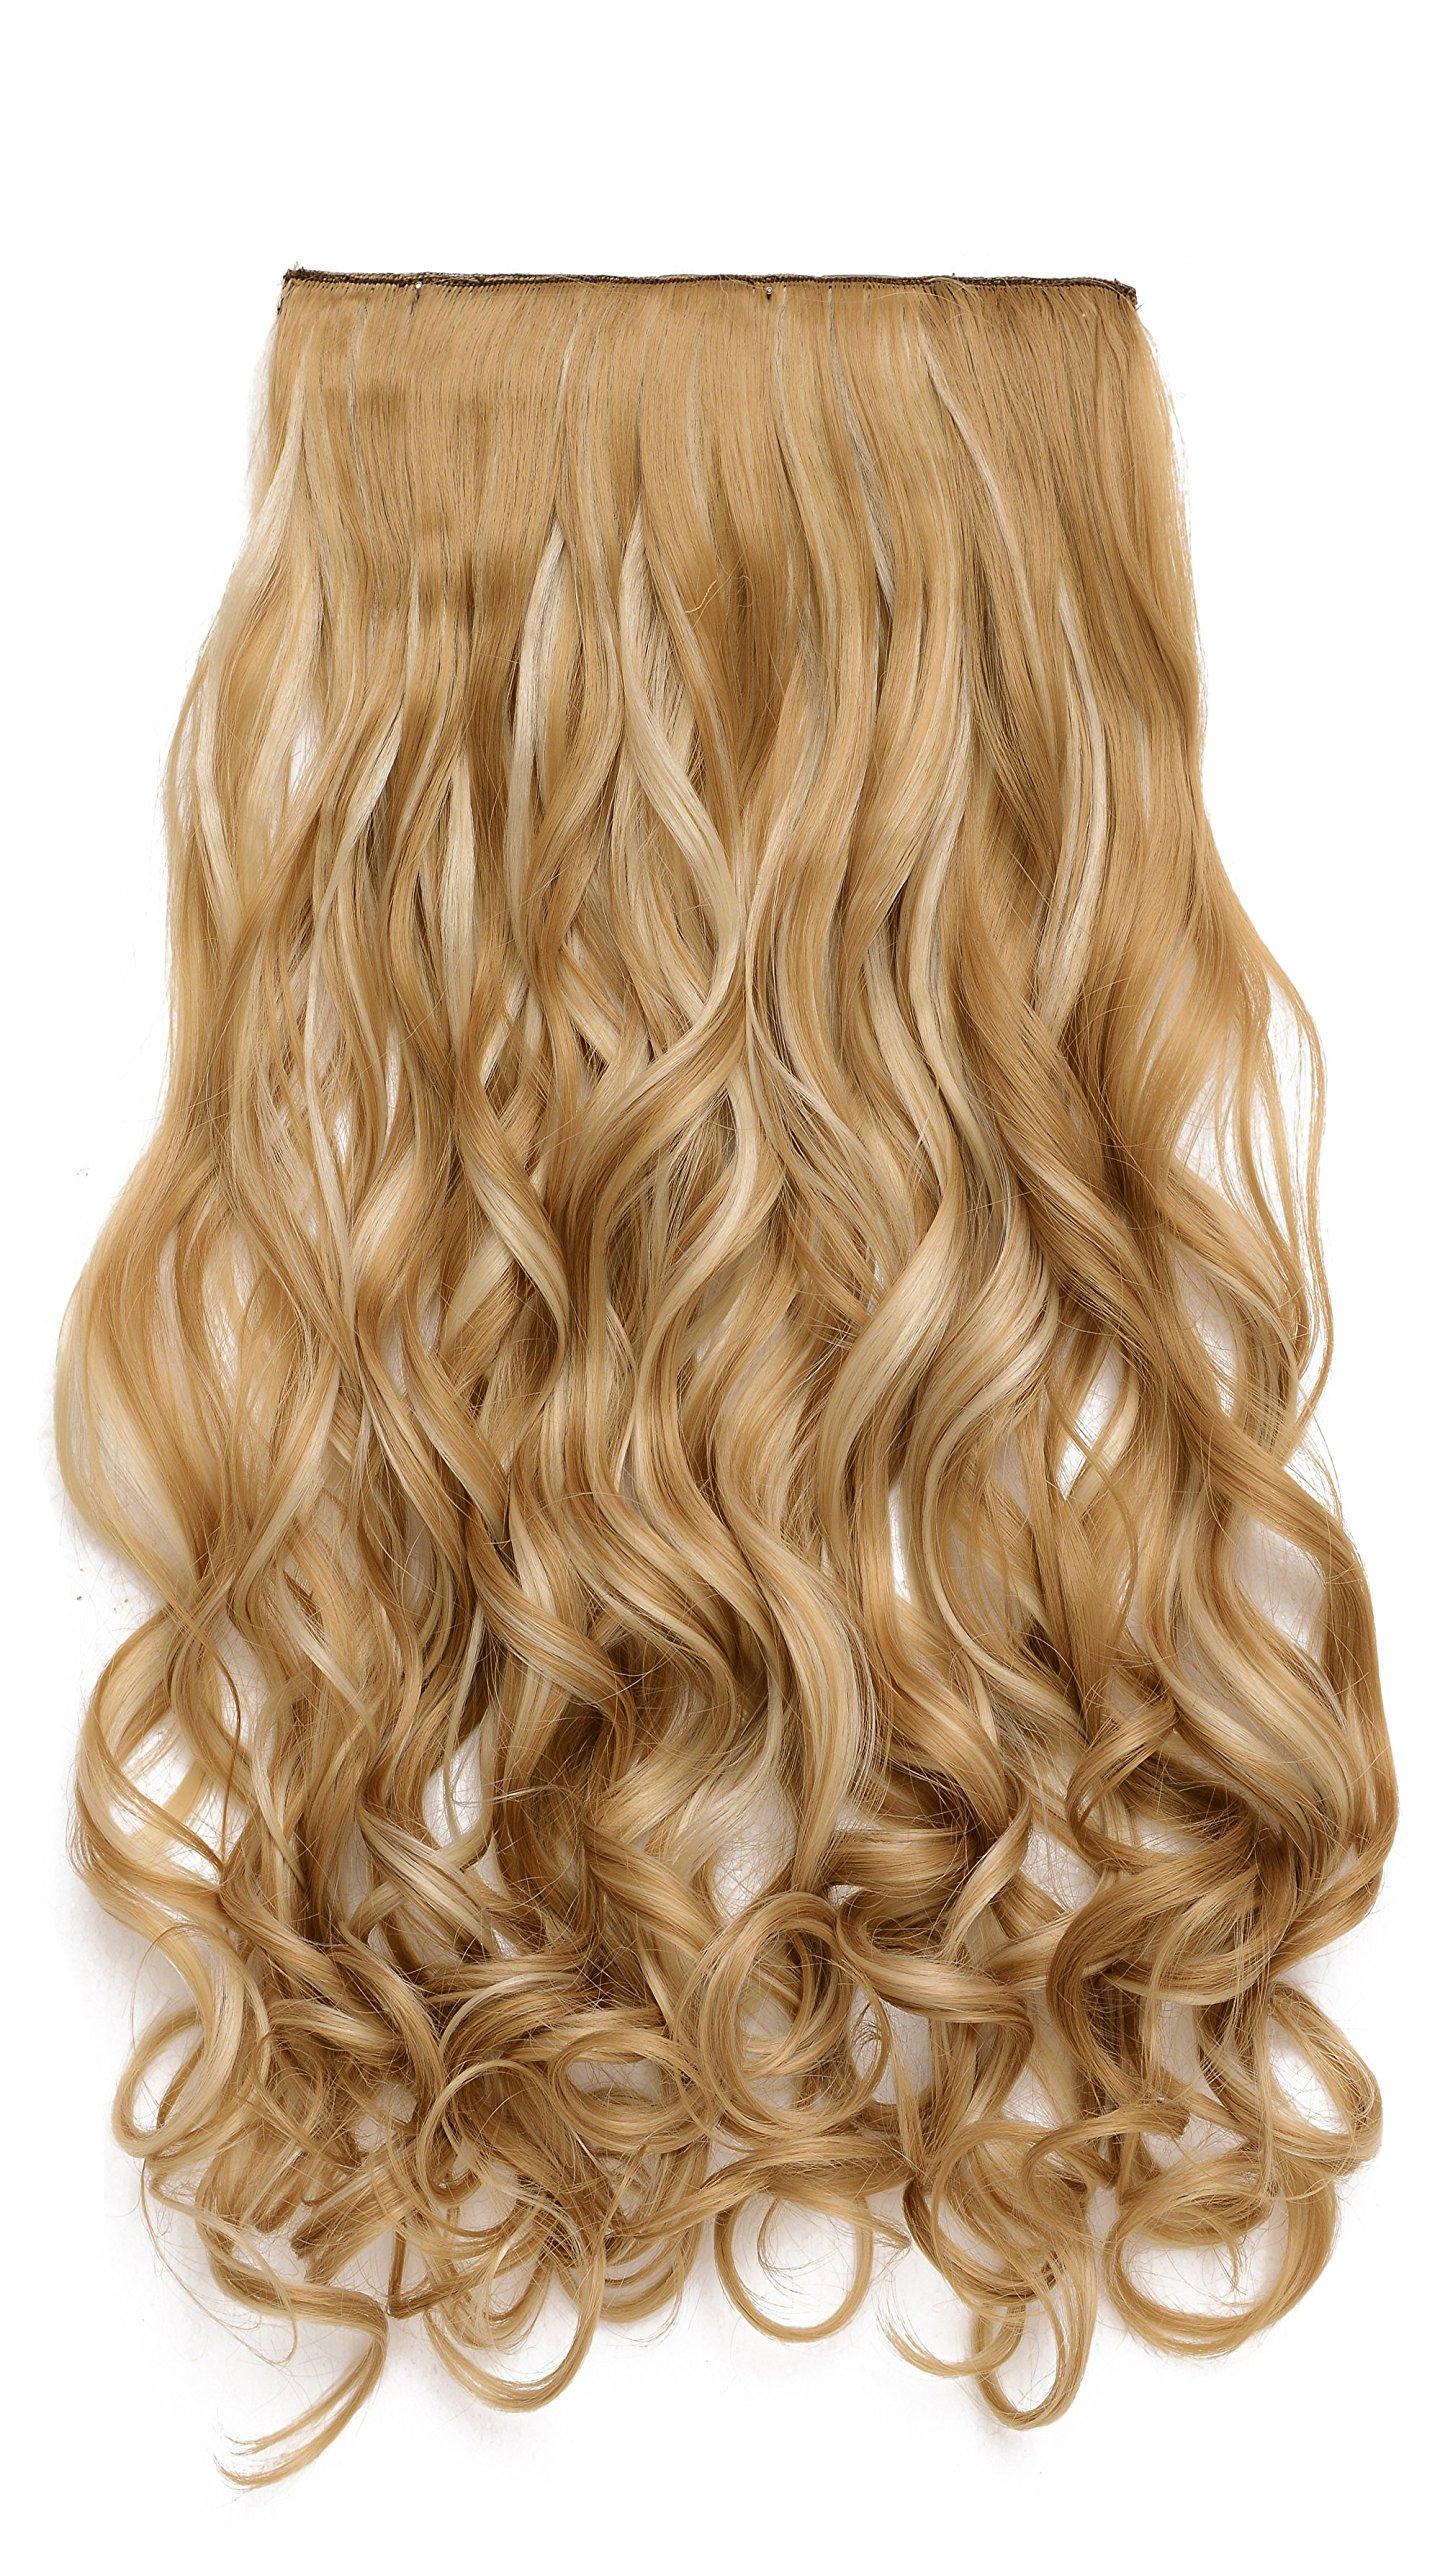 Amazon onedor 20 curly full head clip in synthetic hair onedor 20 curly 34 full head synthetic hair extensions clip onin pmusecretfo Choice Image